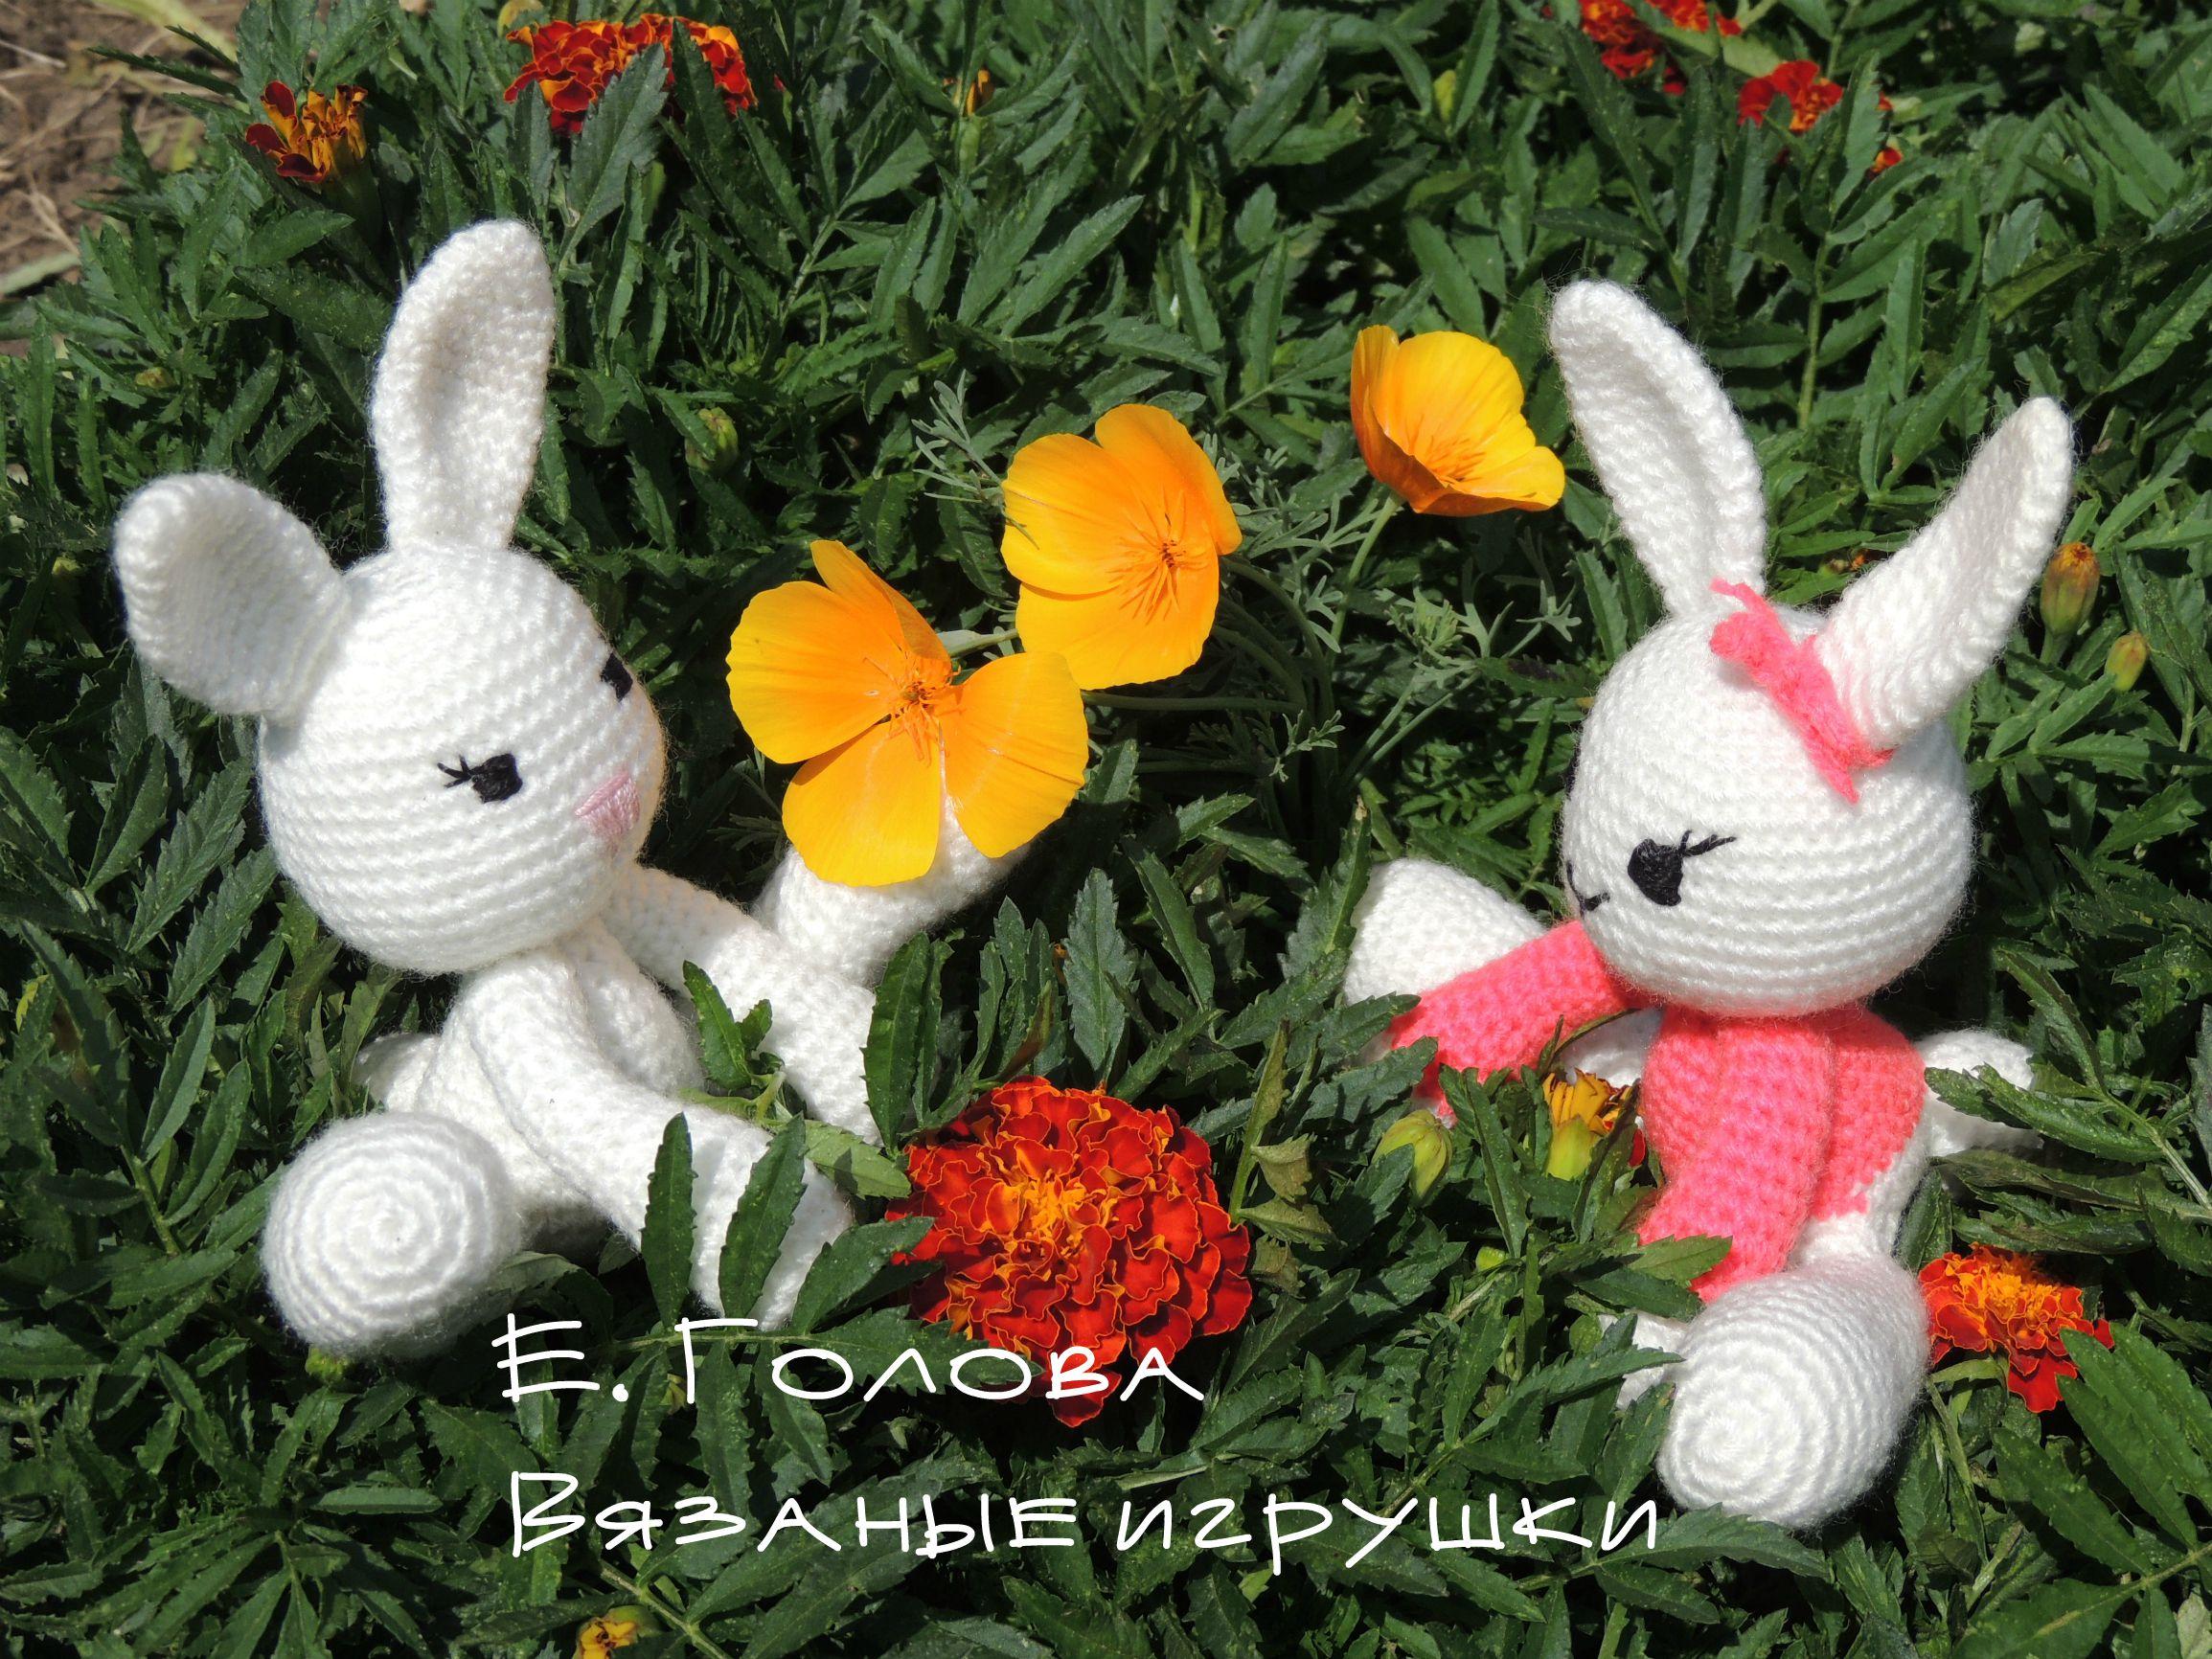 зайцы игрушки подарки заяц